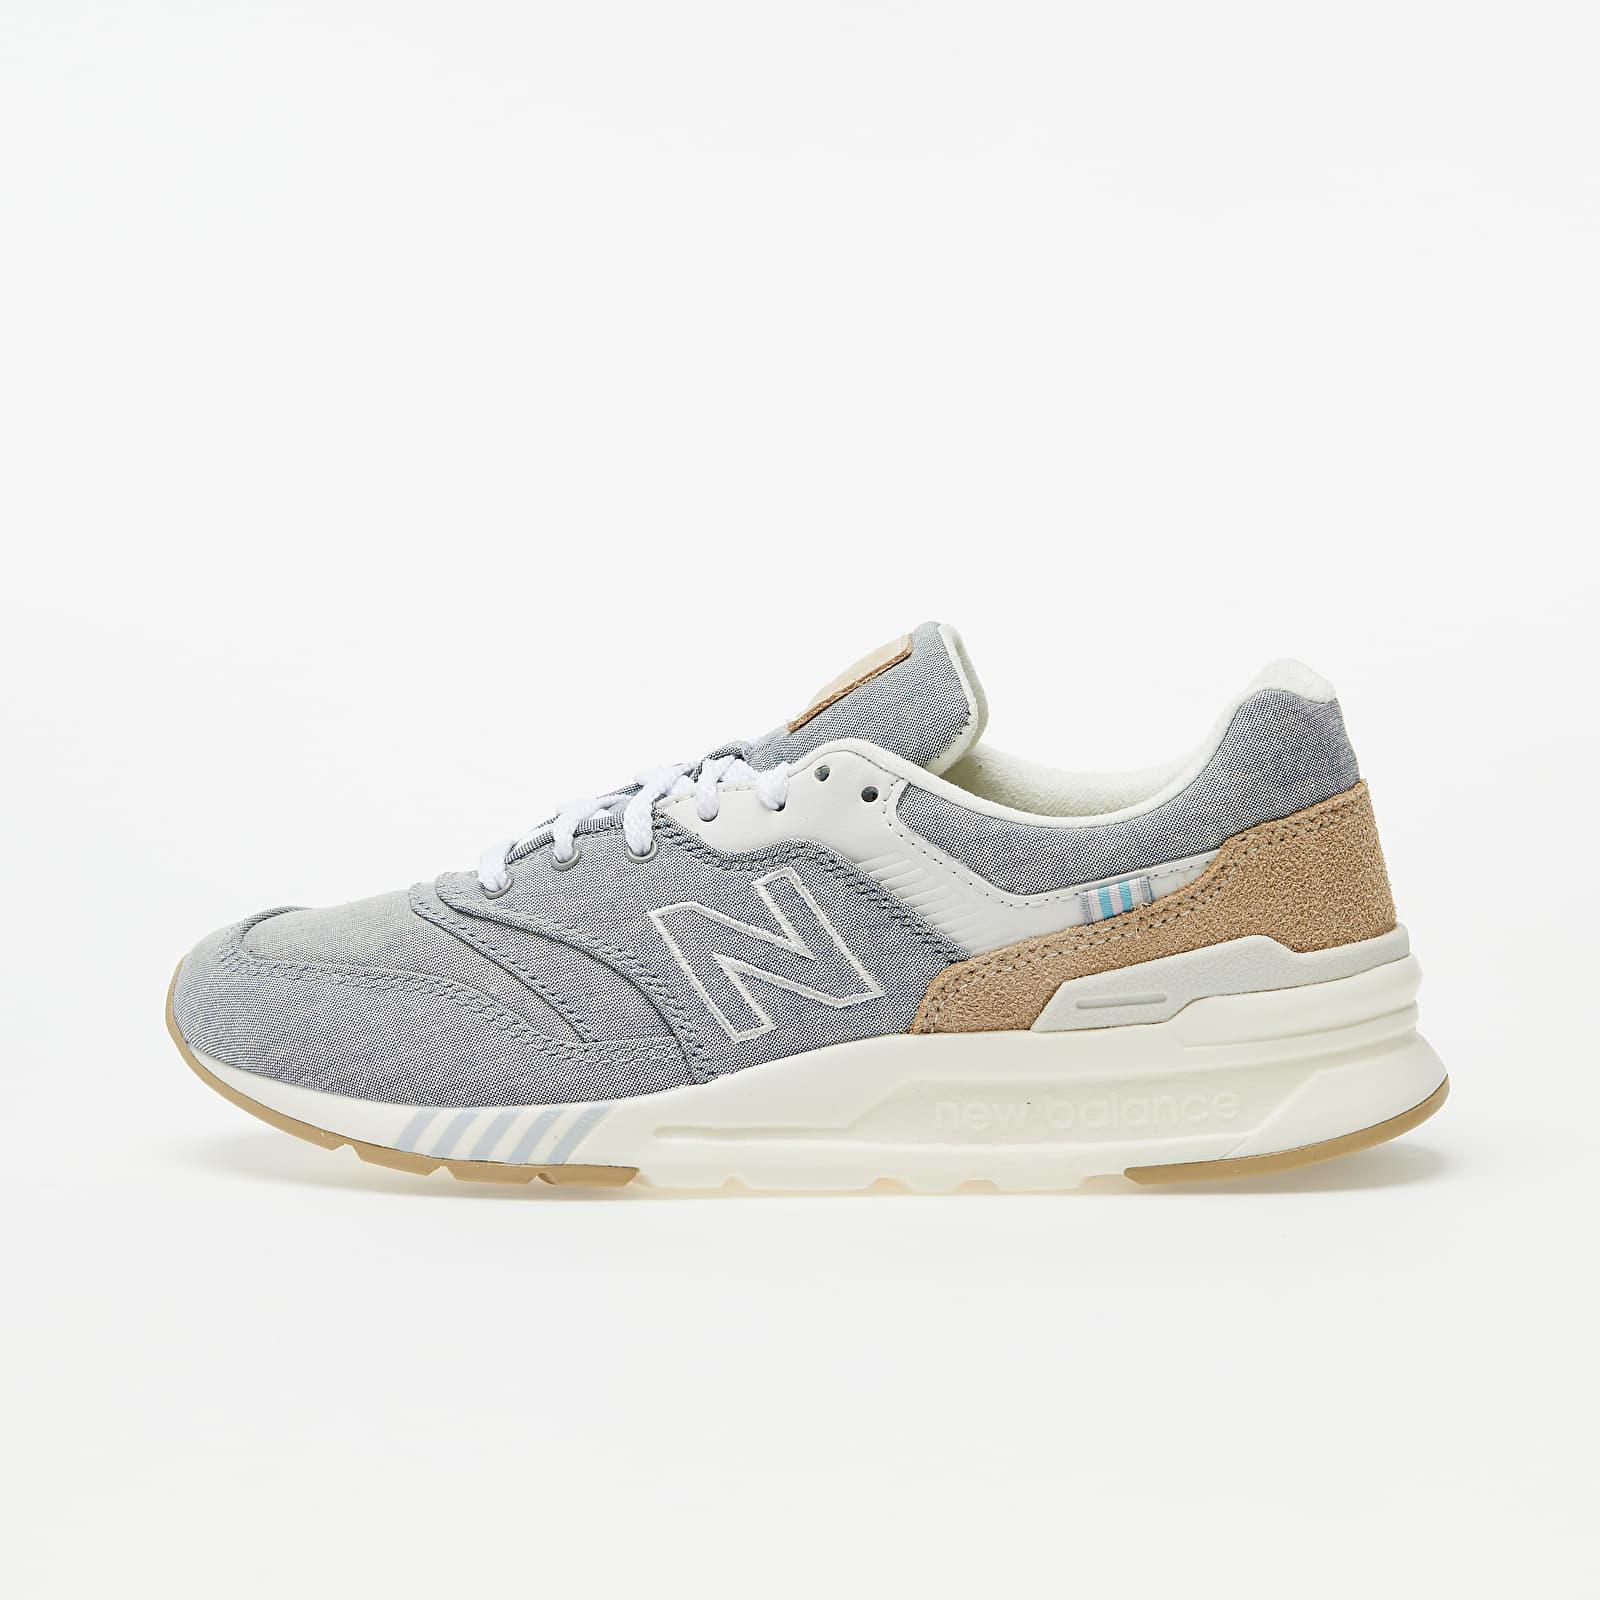 New Balance 997 Grey/ Beige EUR 37